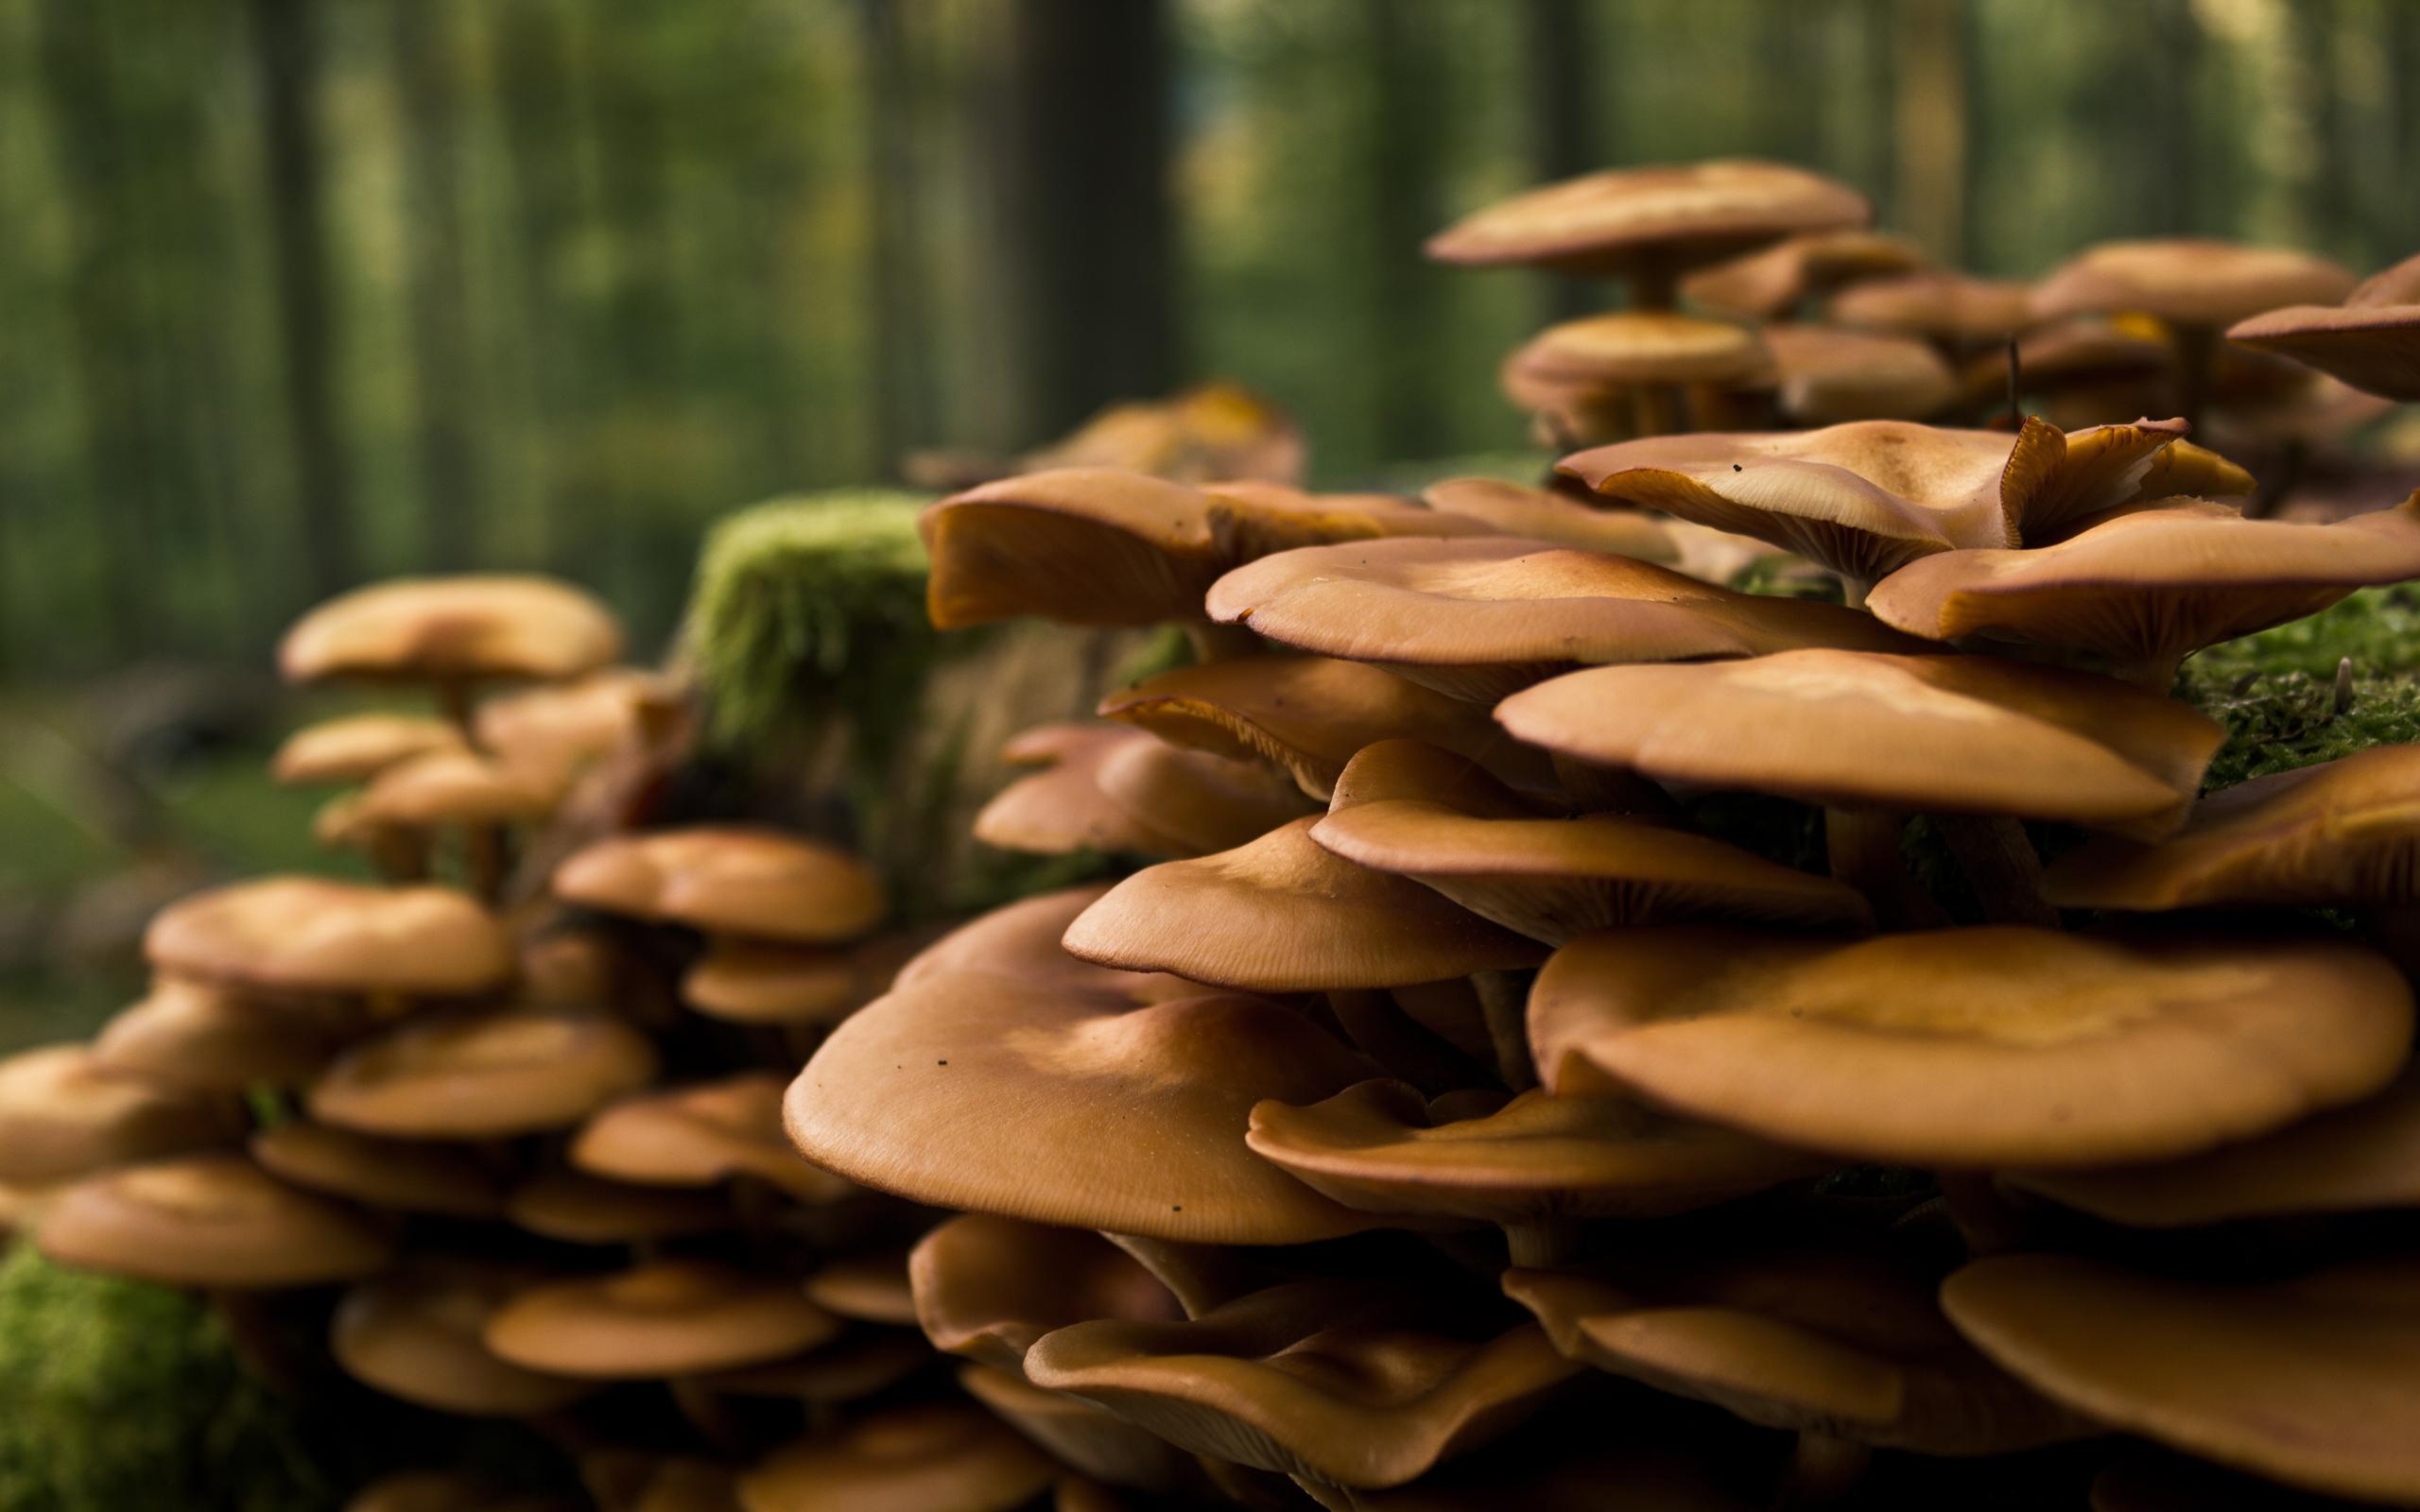 Mushrooms by MrFolder, fungi, nature, forest, trees, vegetation, outside, mushrooms